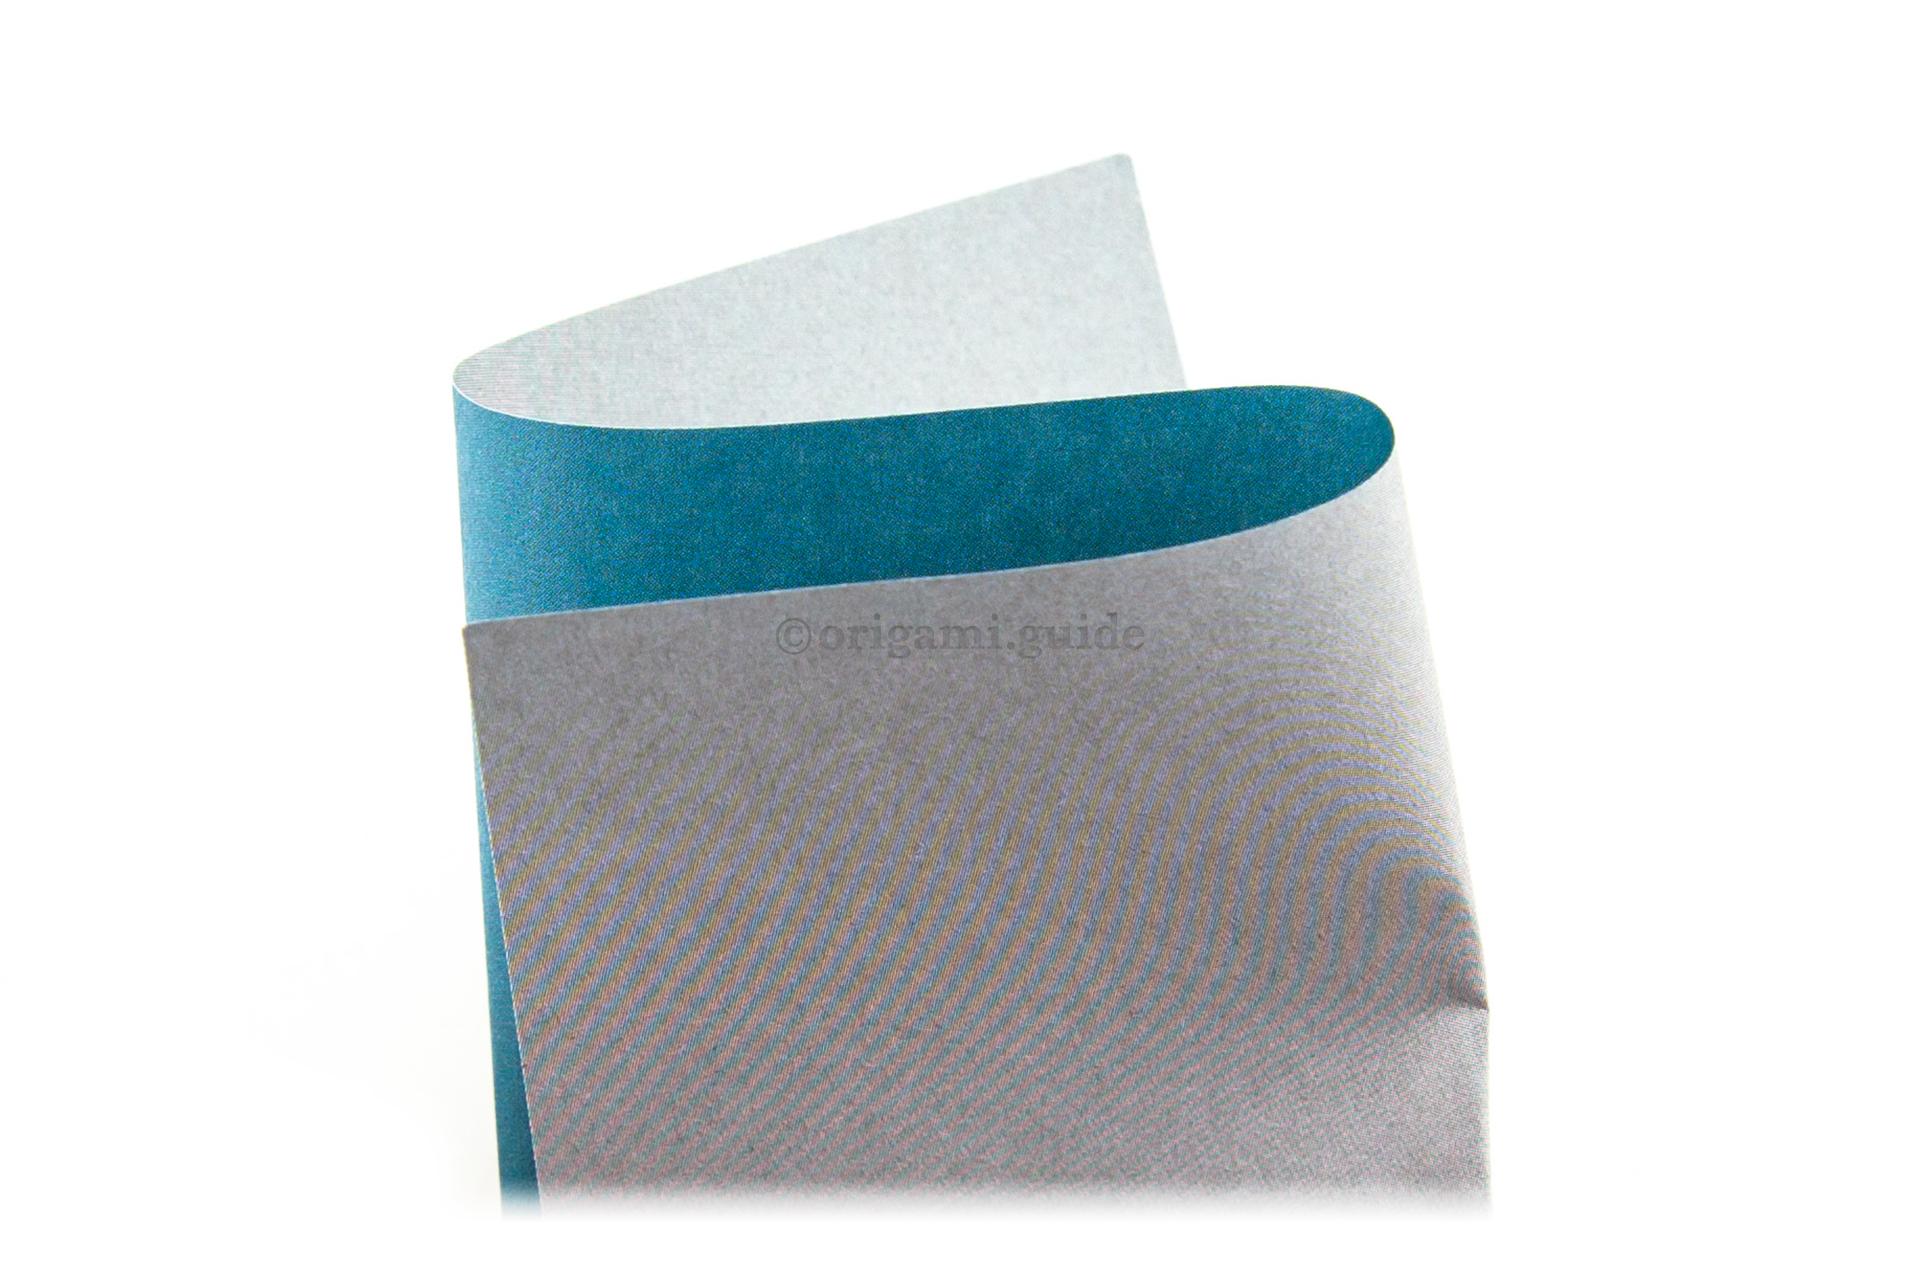 Origami Box (Traditional / Box Divider - Paolo Bascetta) - YouTube | 1280x1920